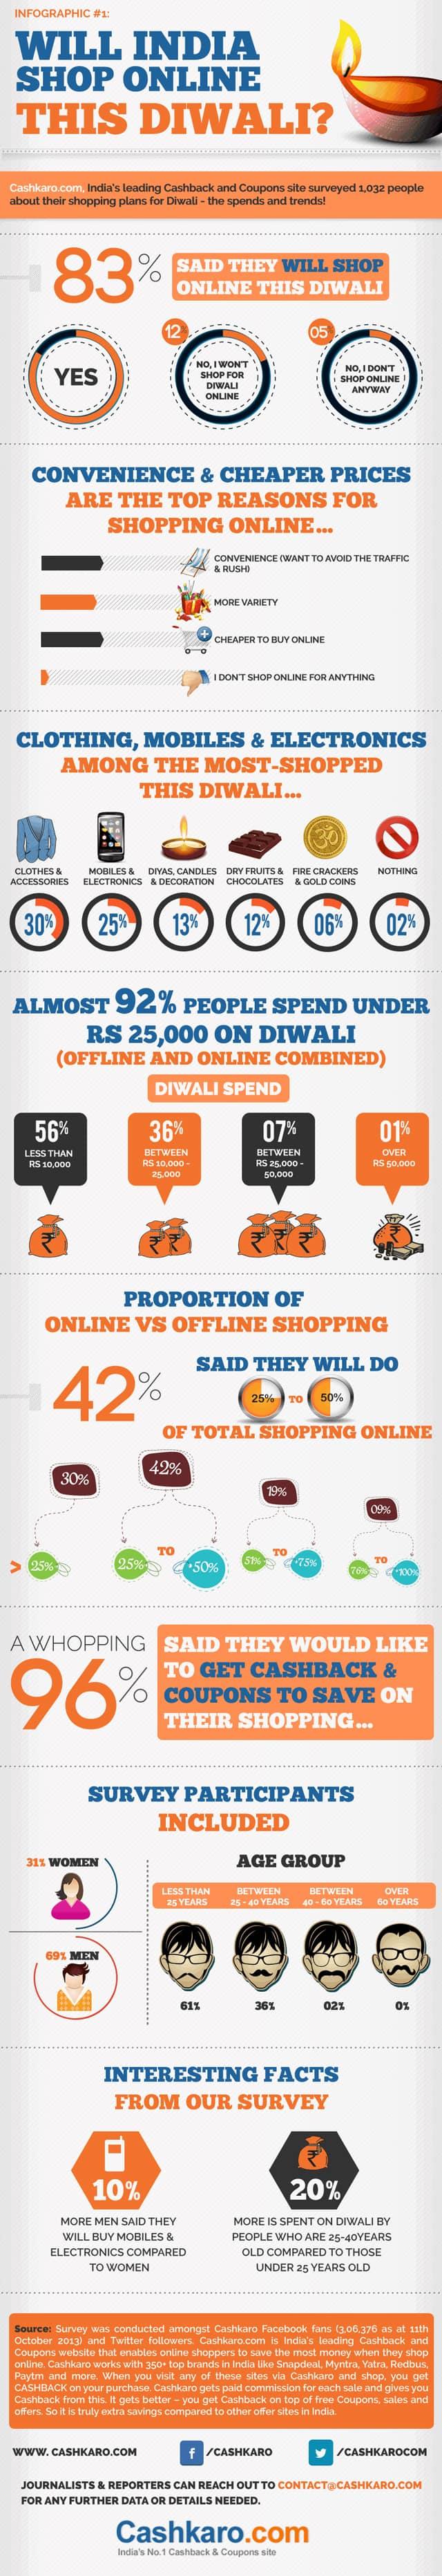 Online Shopping Diwali Tech18 - Infographic